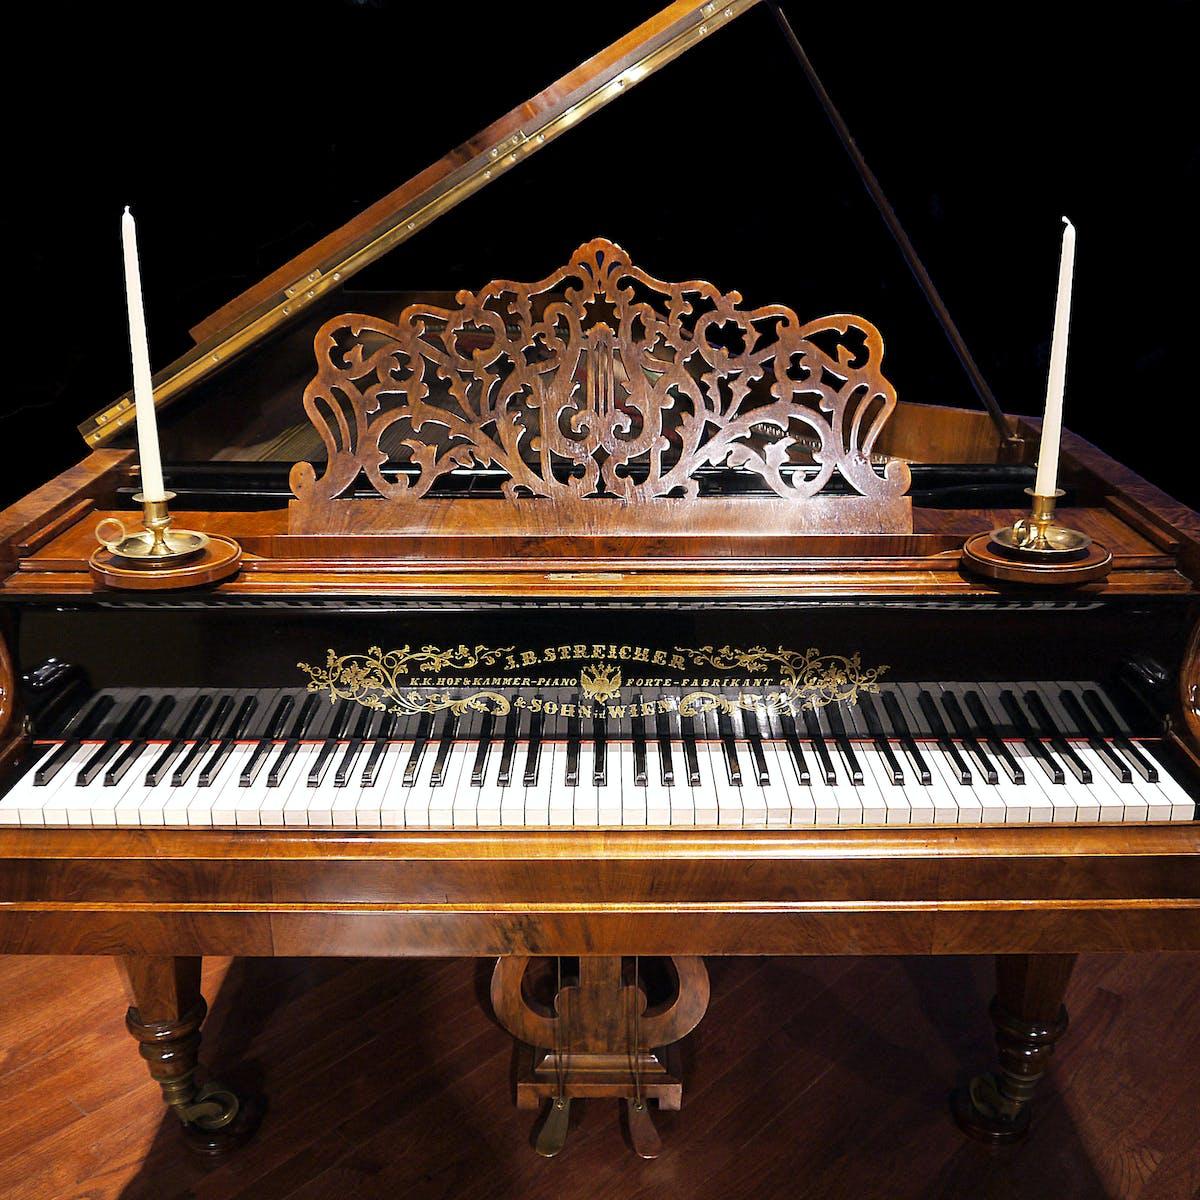 Decoding the music masterpieces: Brahms's Piano Quartet in G minor